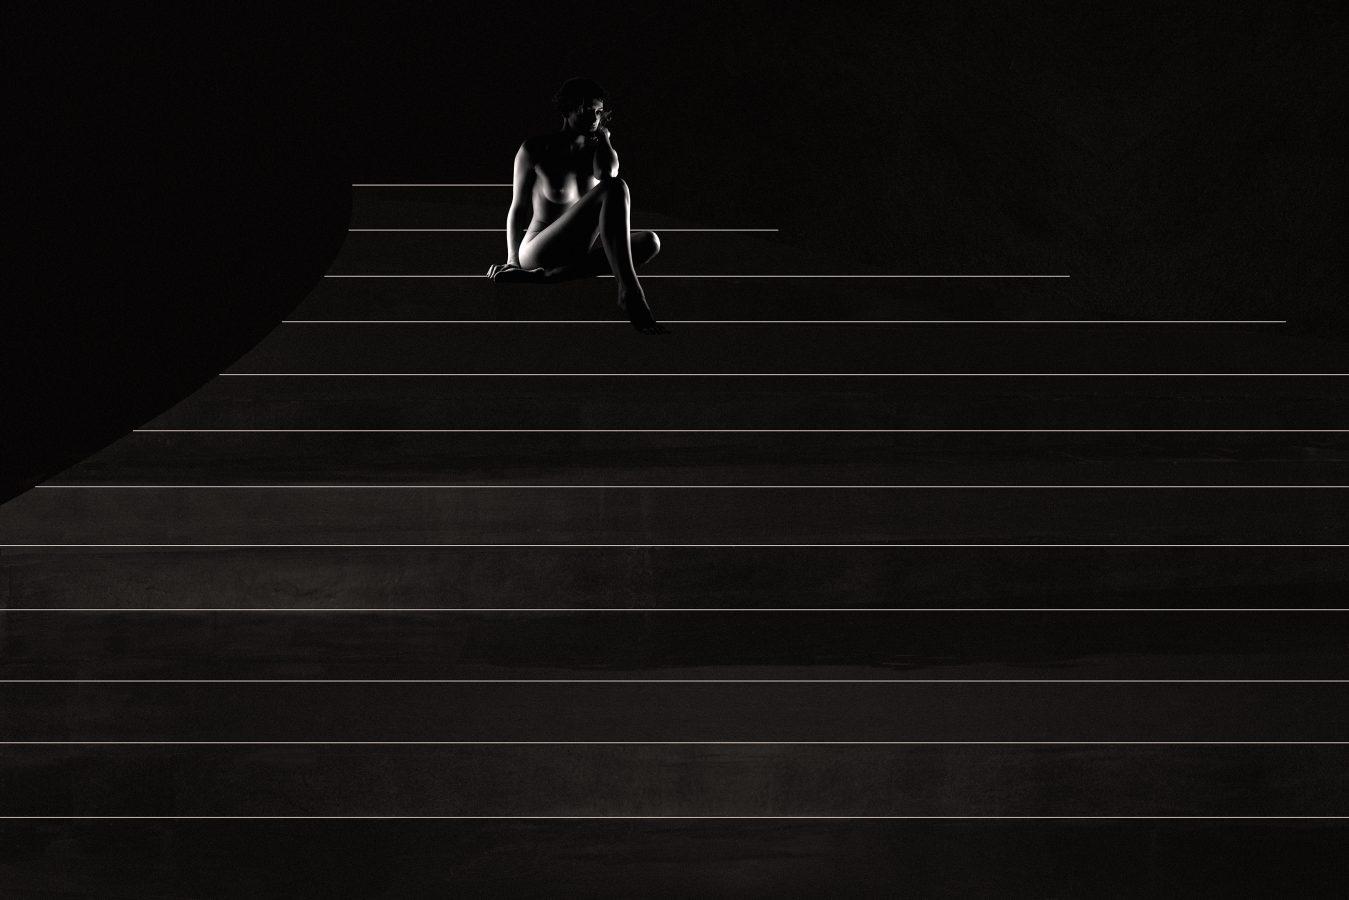 stairs-def-jjm-modif-light-1349x900.jpg